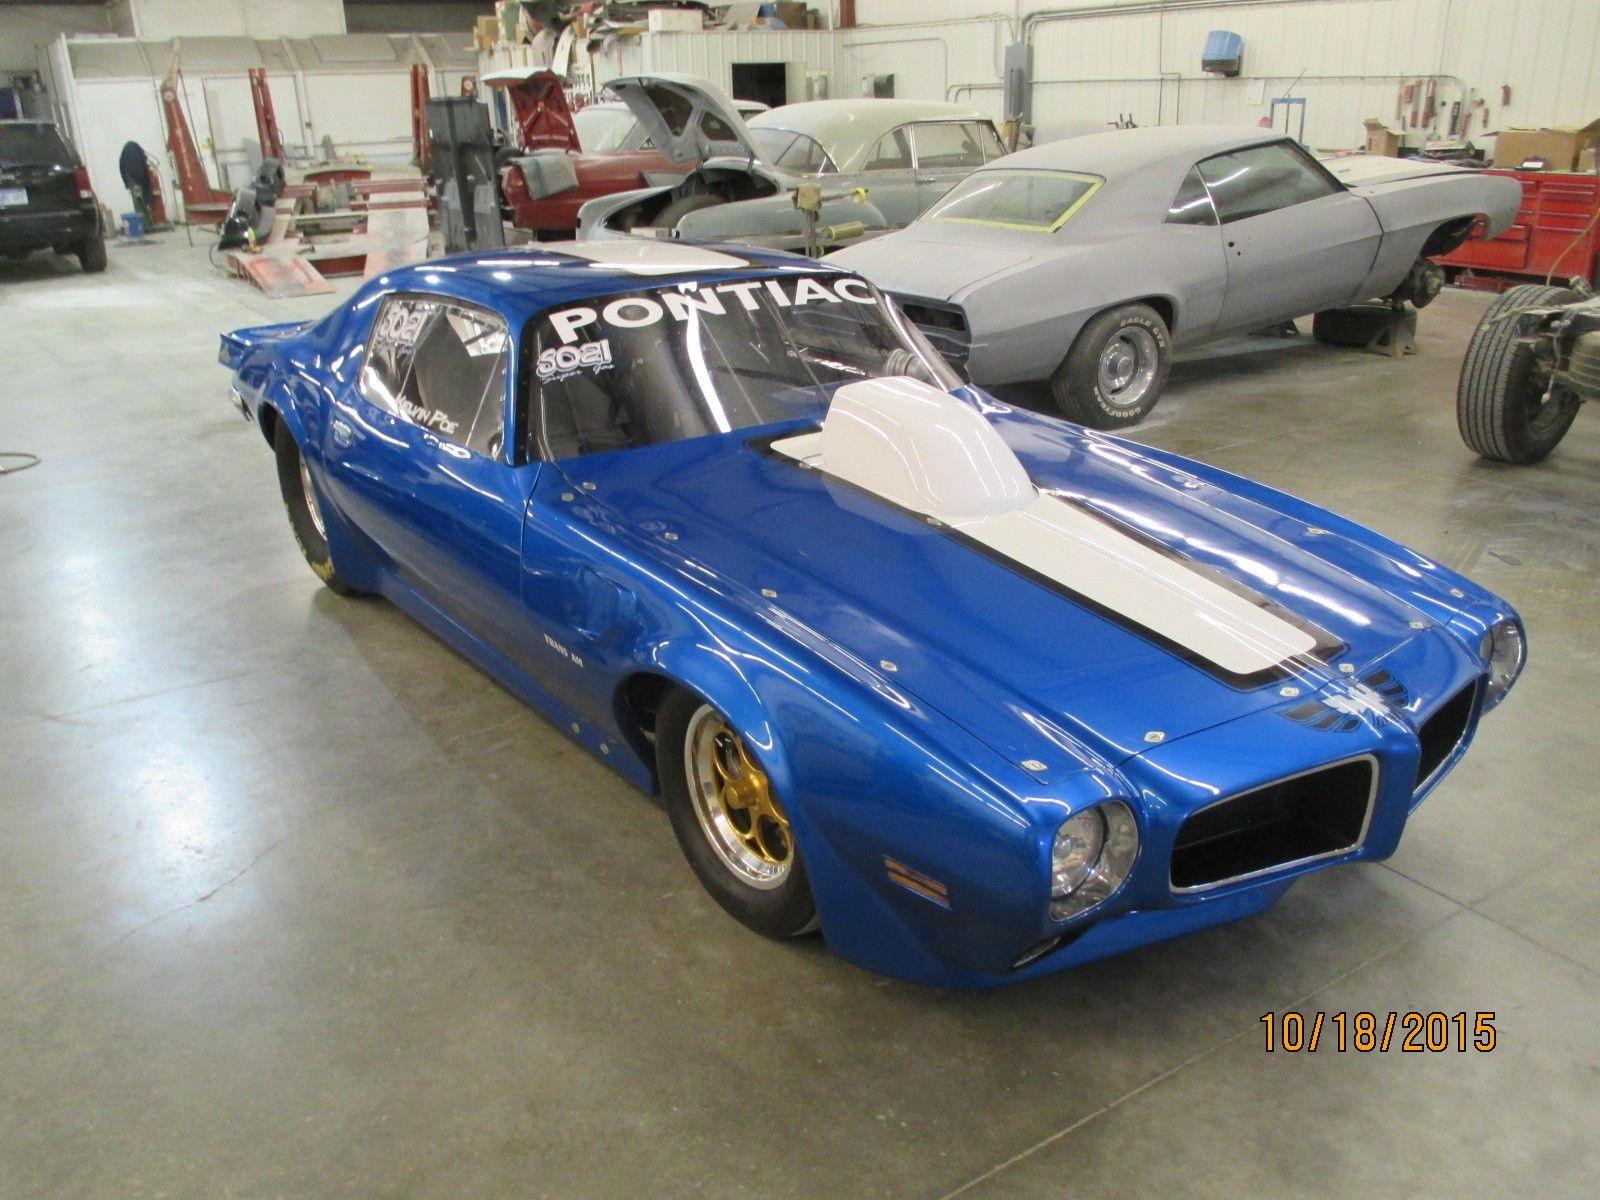 http://bangshift.com/wp-content/uploads/2015/11/1970-Pontiac-Trans ...